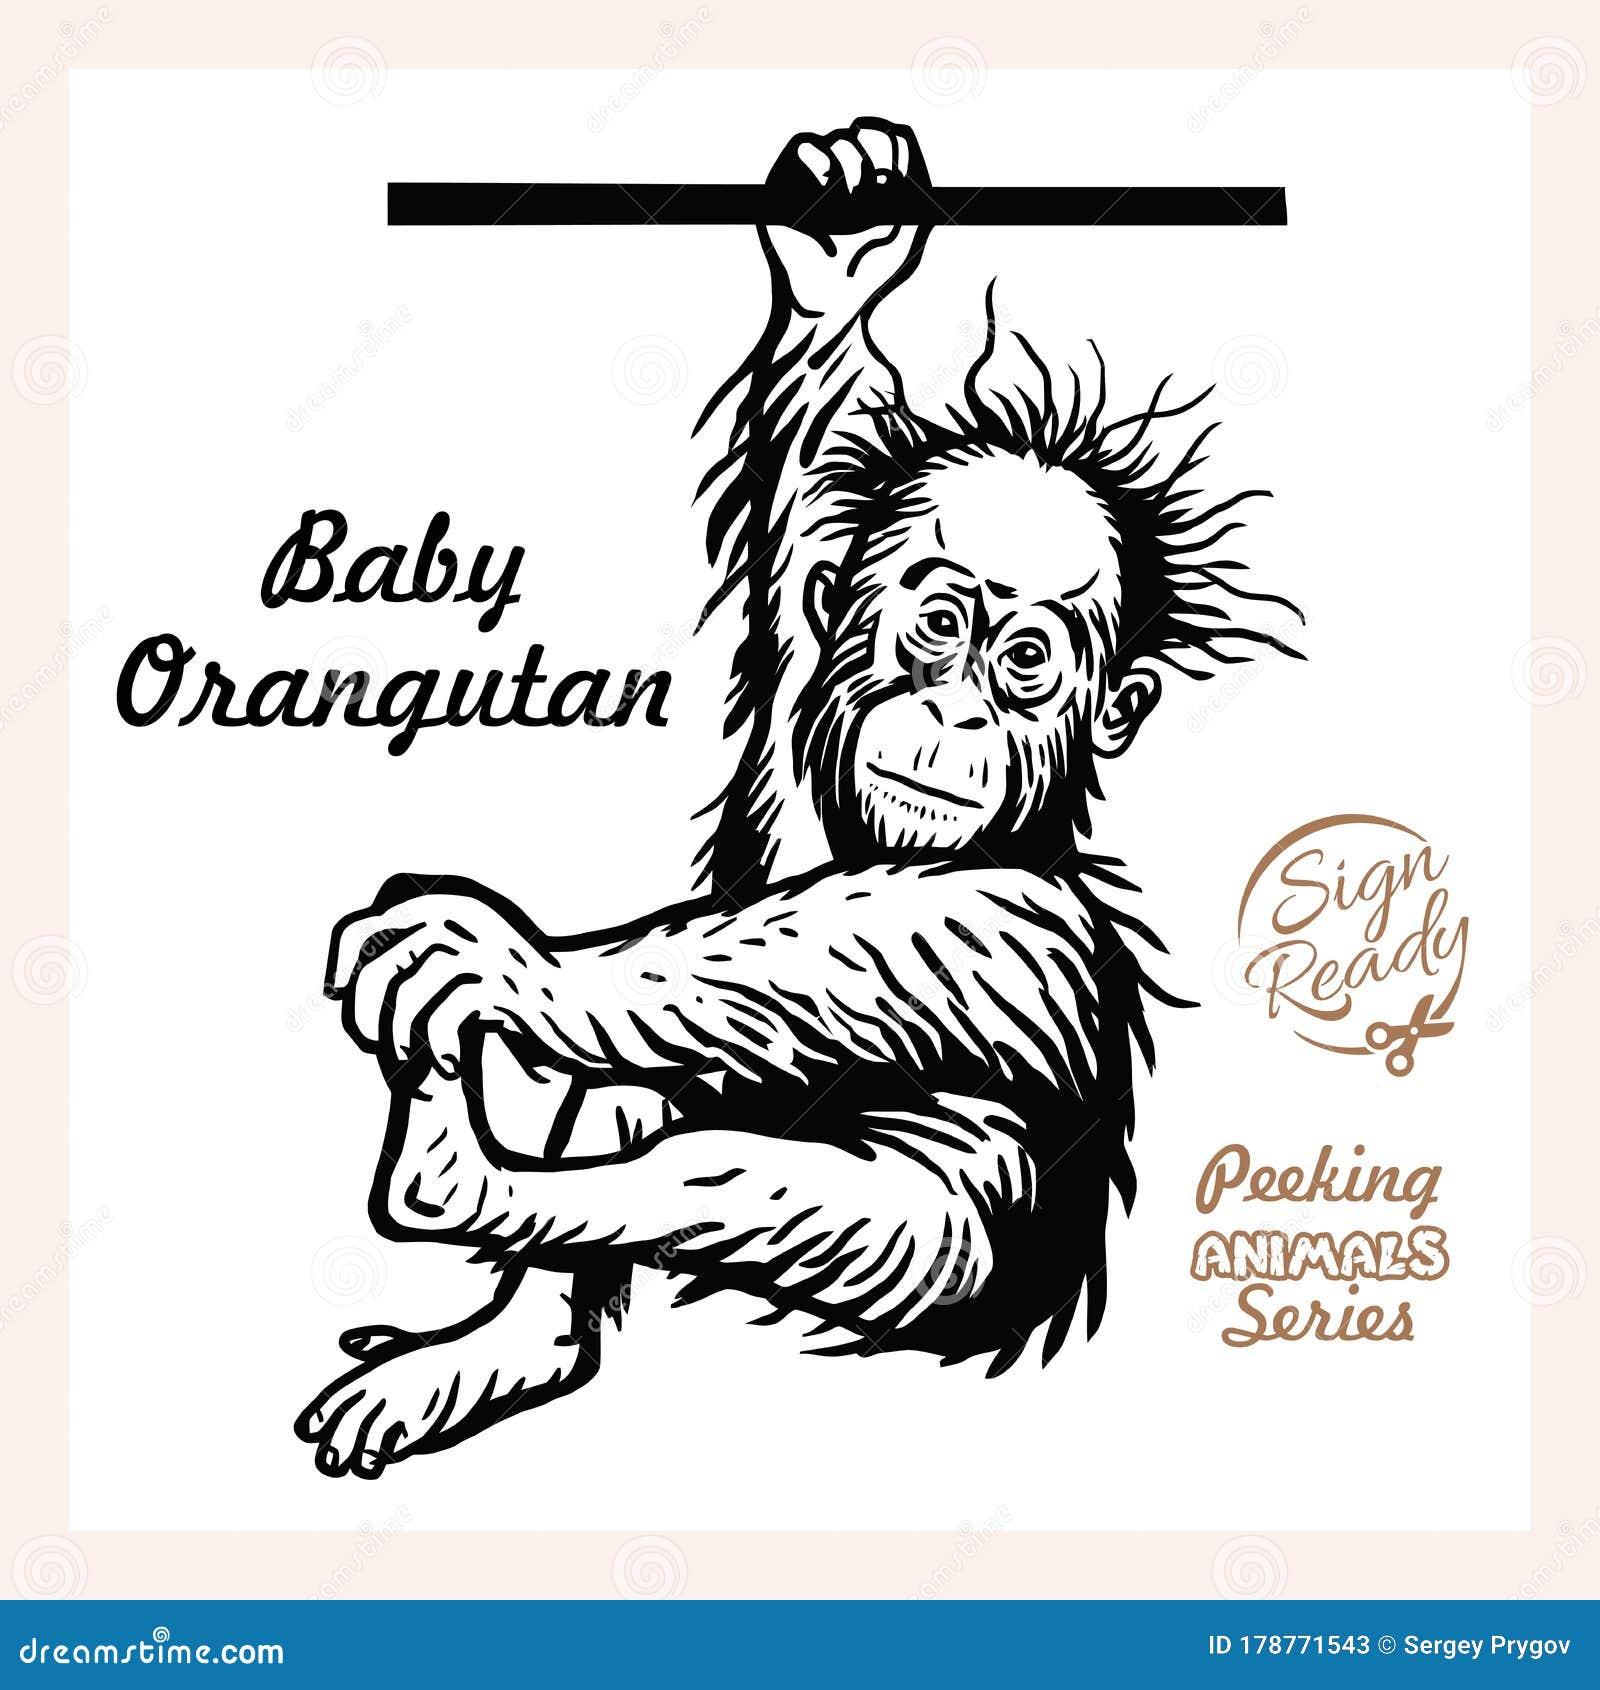 Cartoon Baby Orangutan Stock Illustrations 503 Cartoon Baby Orangutan Stock Illustrations Vectors Clipart Dreamstime